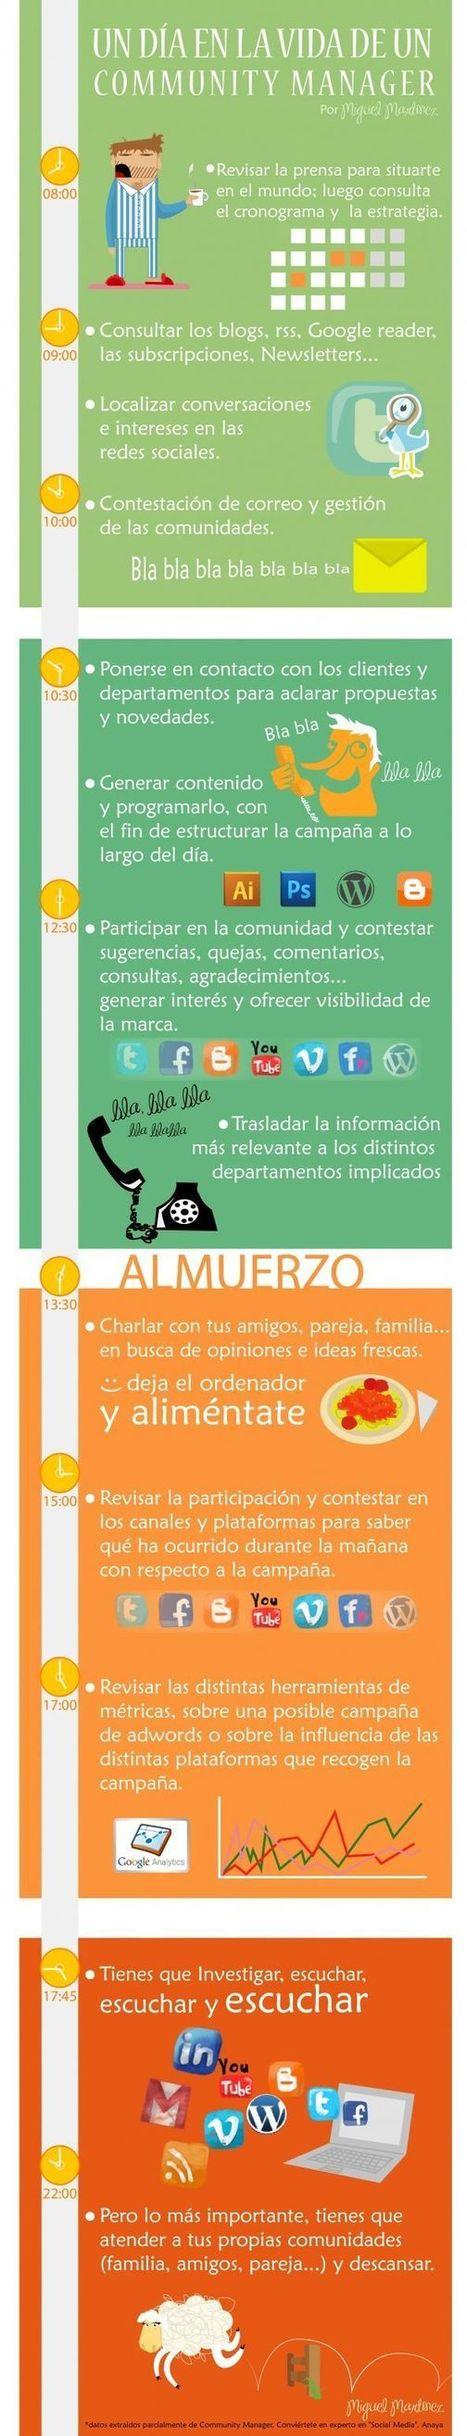 Socialmedia | Curador de Conteúdos - Community Manager - Web 2.0 | Scoop.it